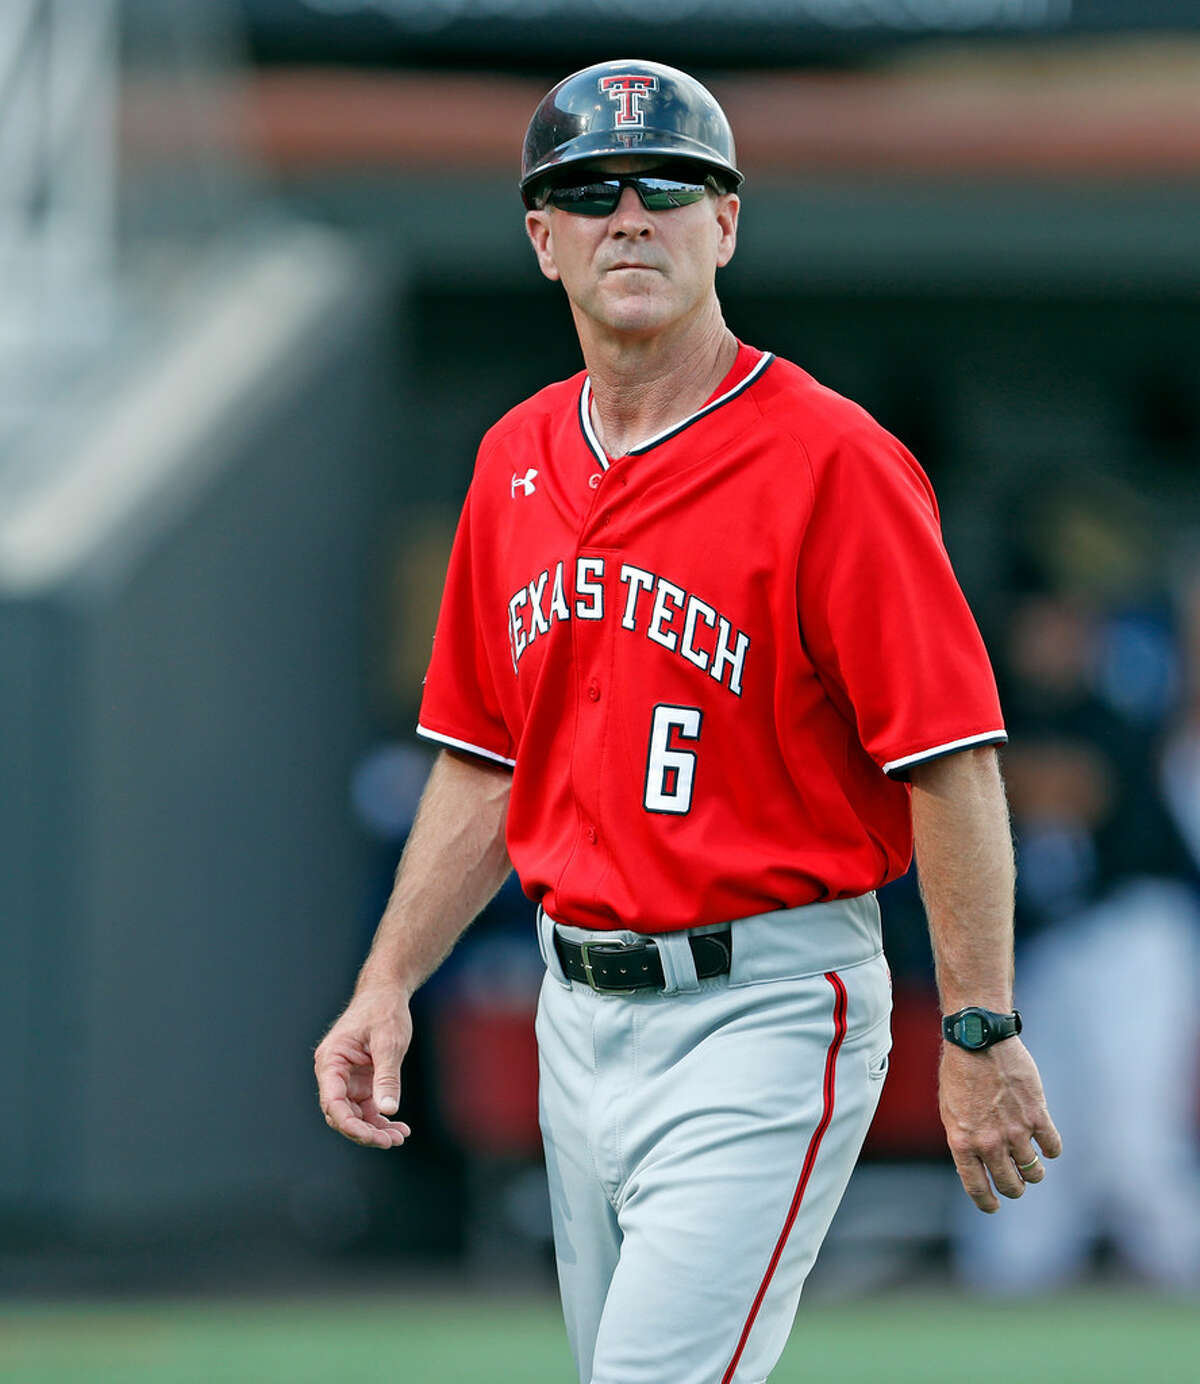 Texas Tech coach Tim Tadlock walks back to the dugout during an NCAA college baseball tournament super regional game against Duke, Sunday, June 10, 2018, in Lubbock, Texas. (Brad Tollefson/Lubbock Avalanche-Journal via AP)